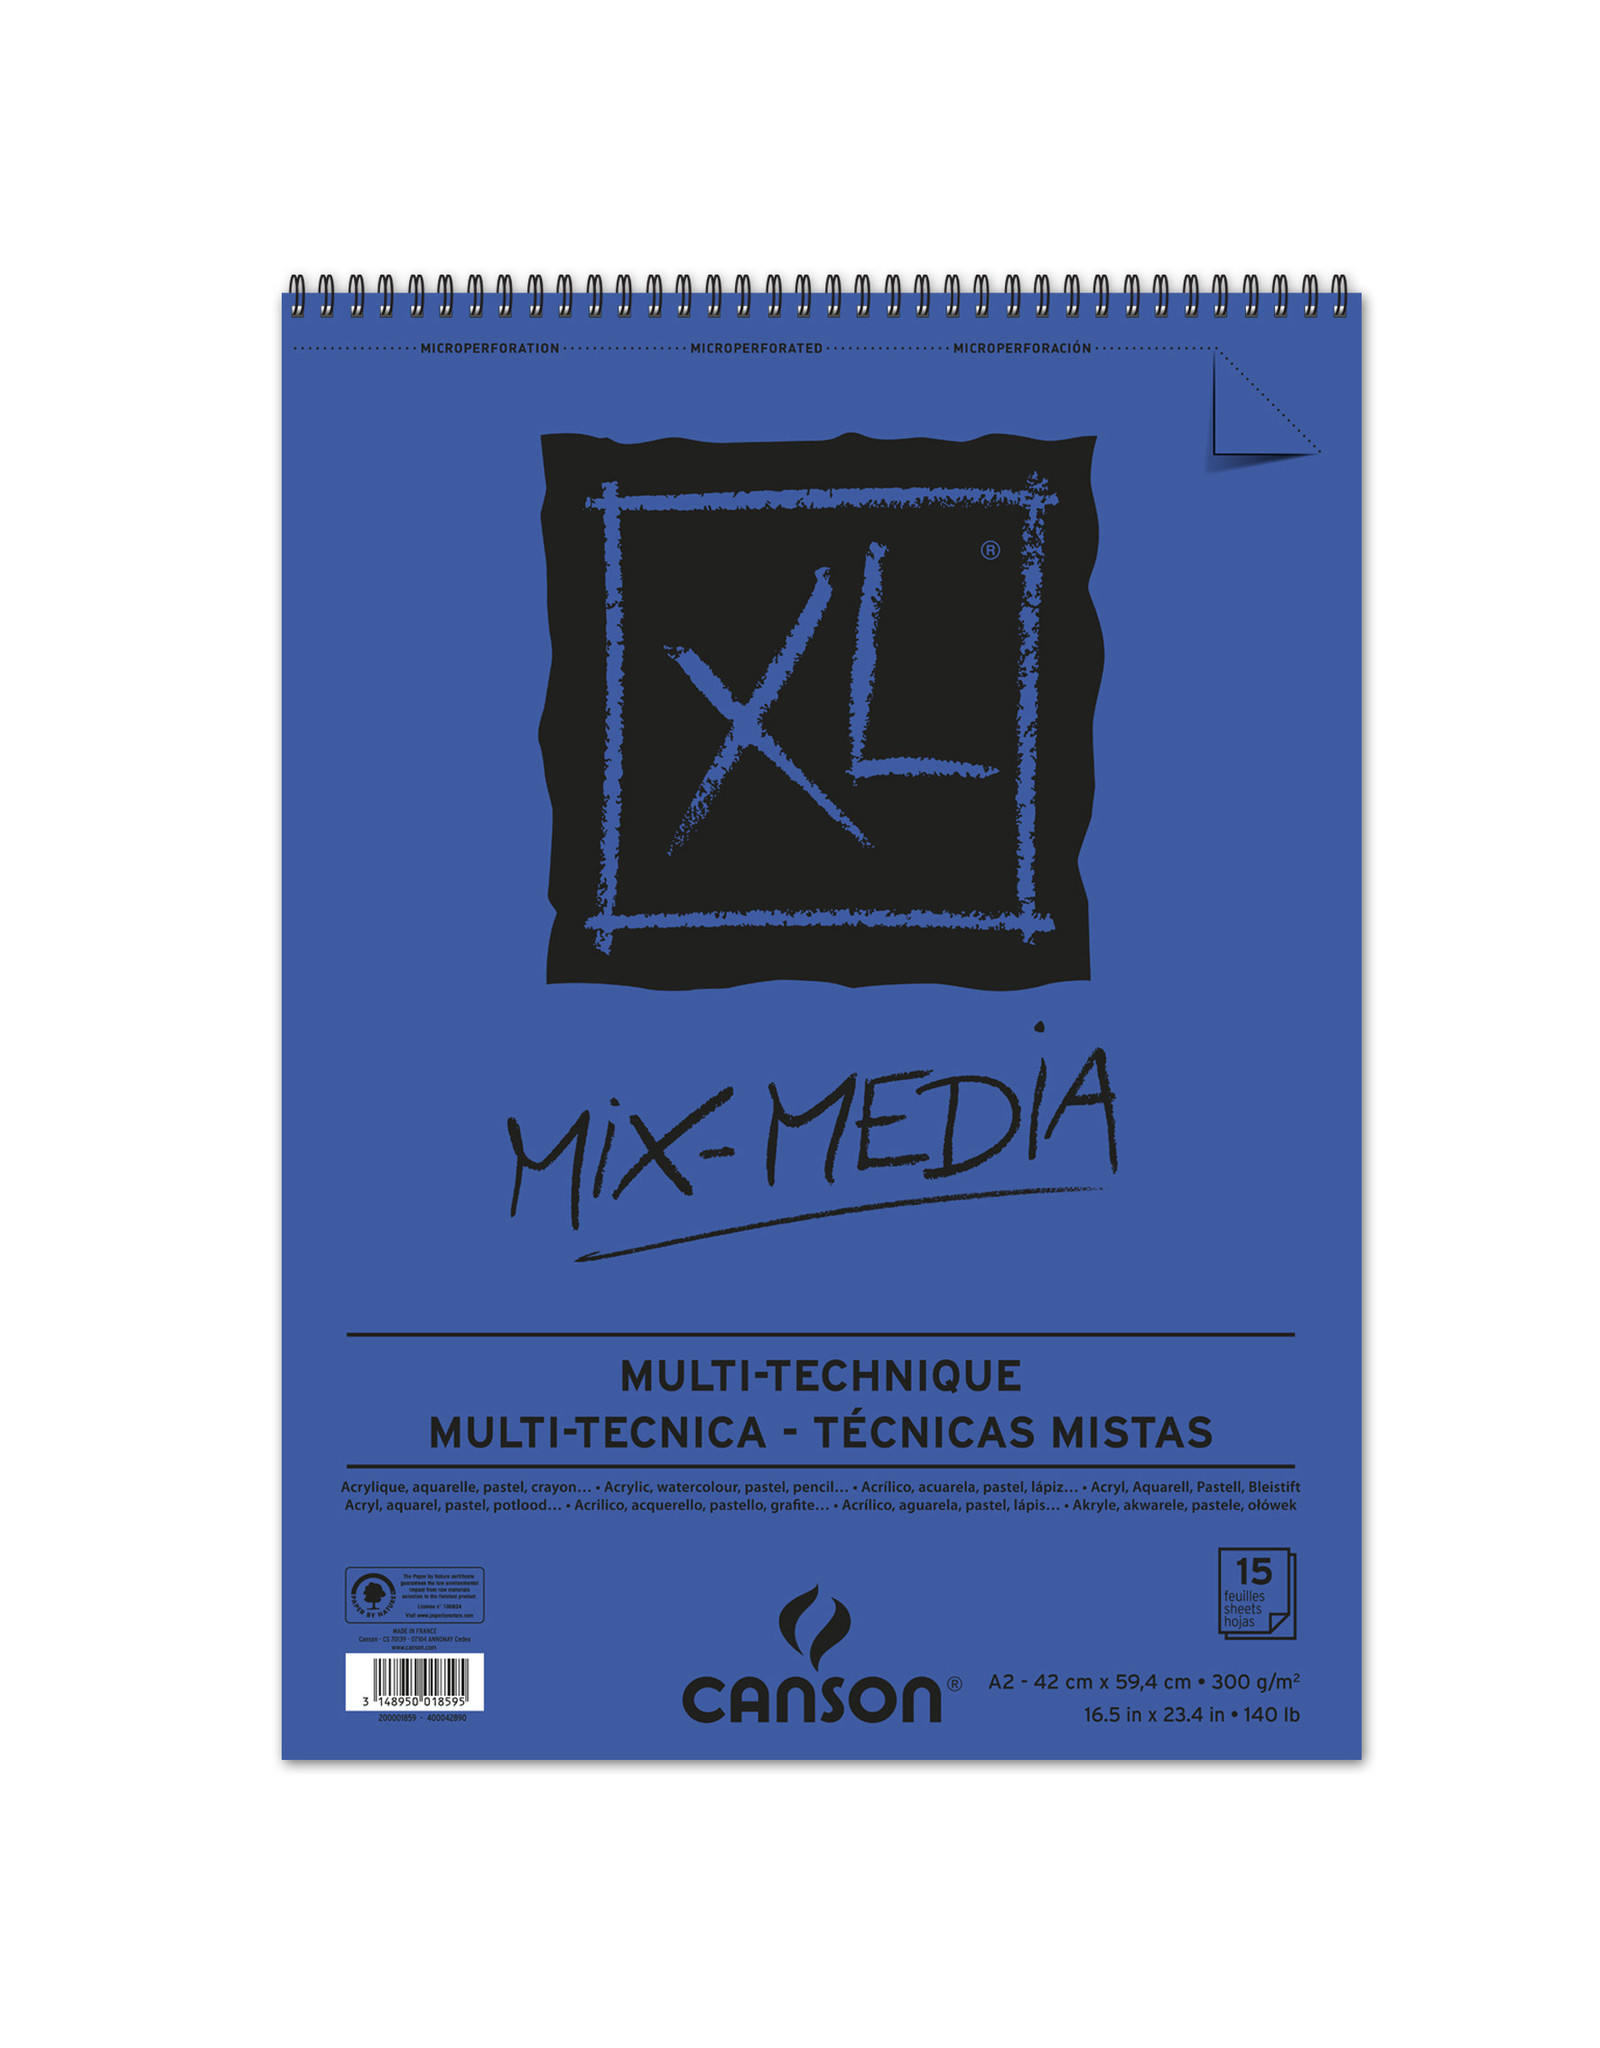 canson Xl album mix media A2